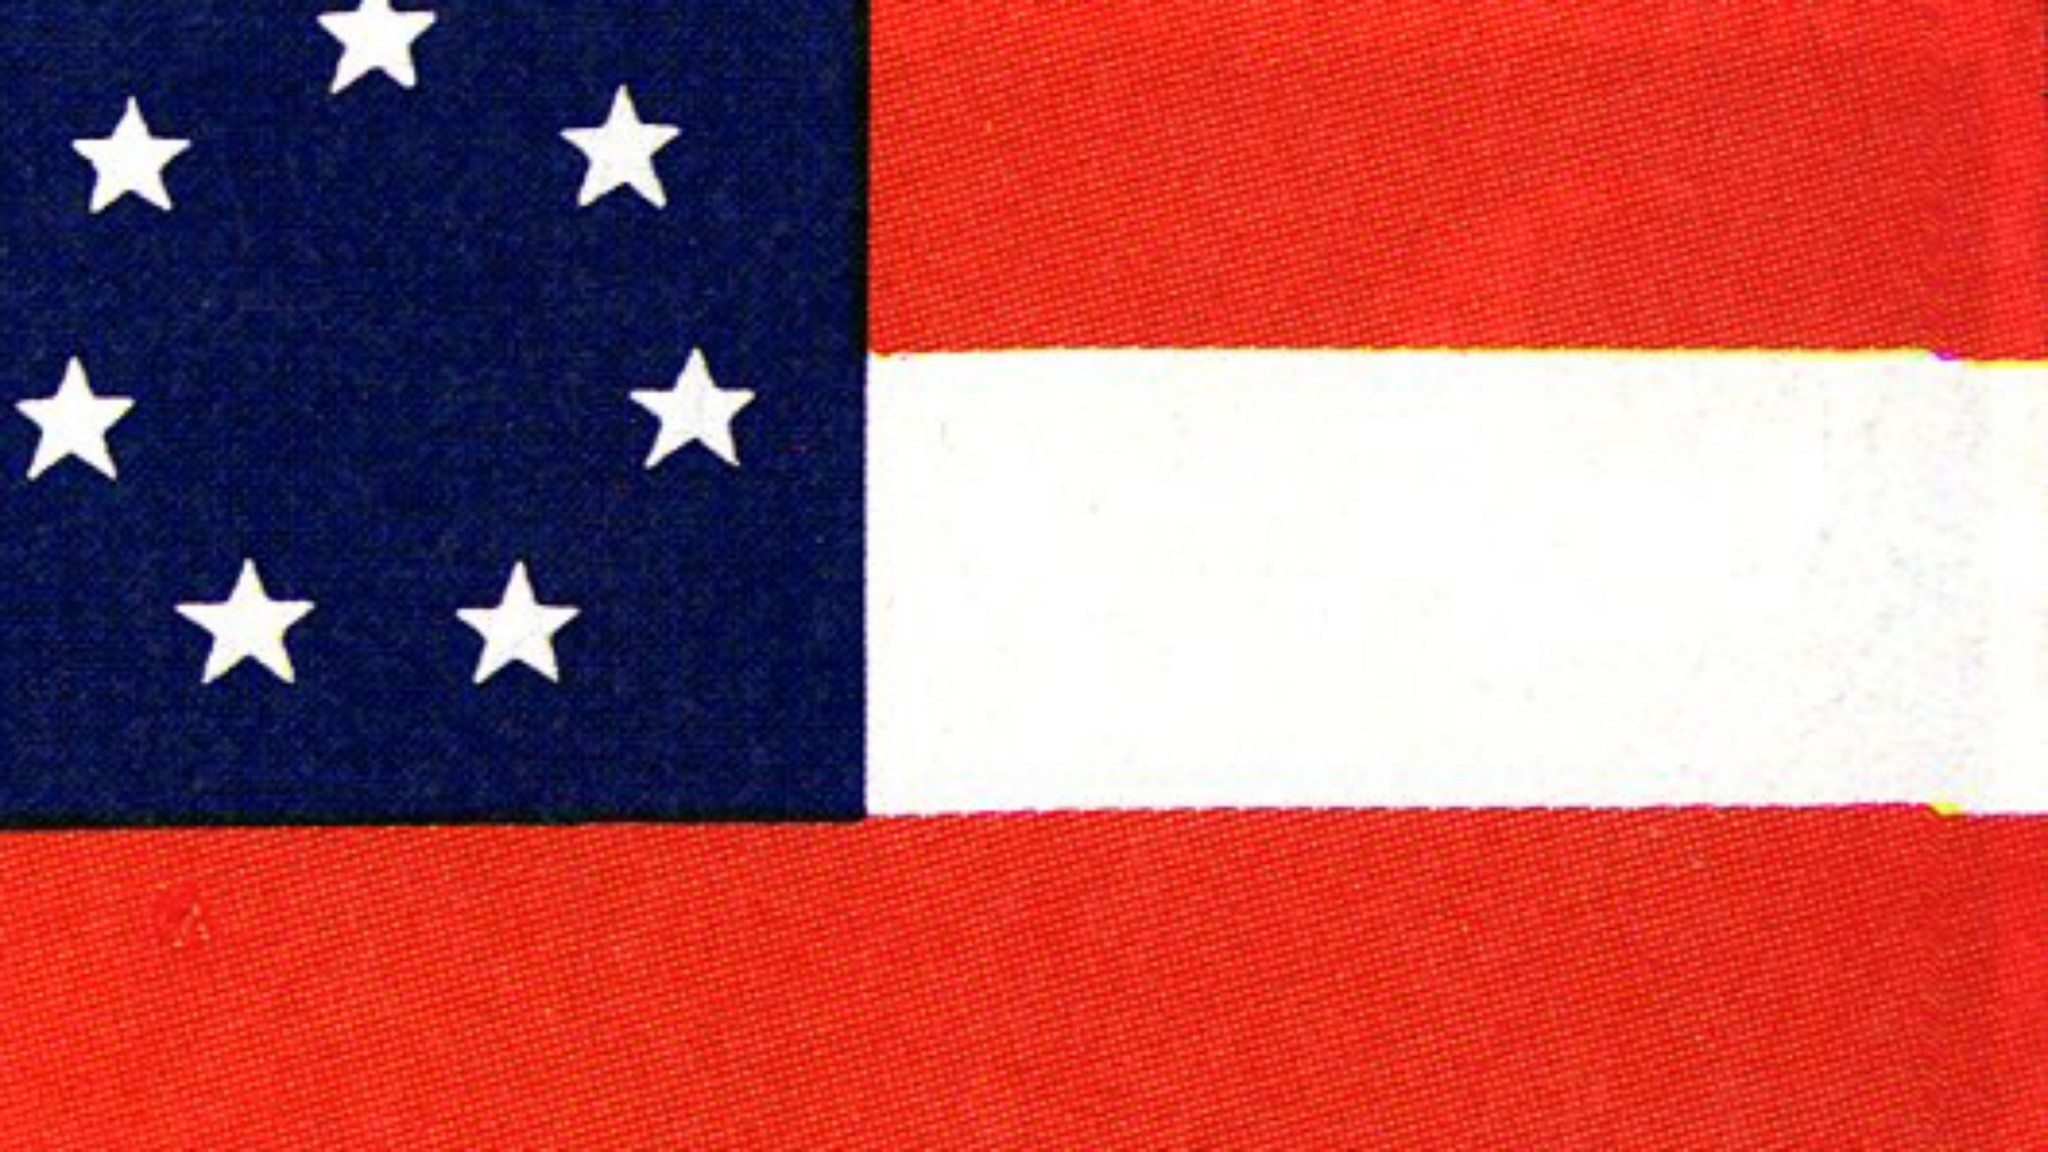 confederate flag hd widescreen wallpapers backgrounds   ololoshenka    Pinterest   Hd widescreen wallpapers, Widescreen wallpaper and Wallpaper  backgrounds